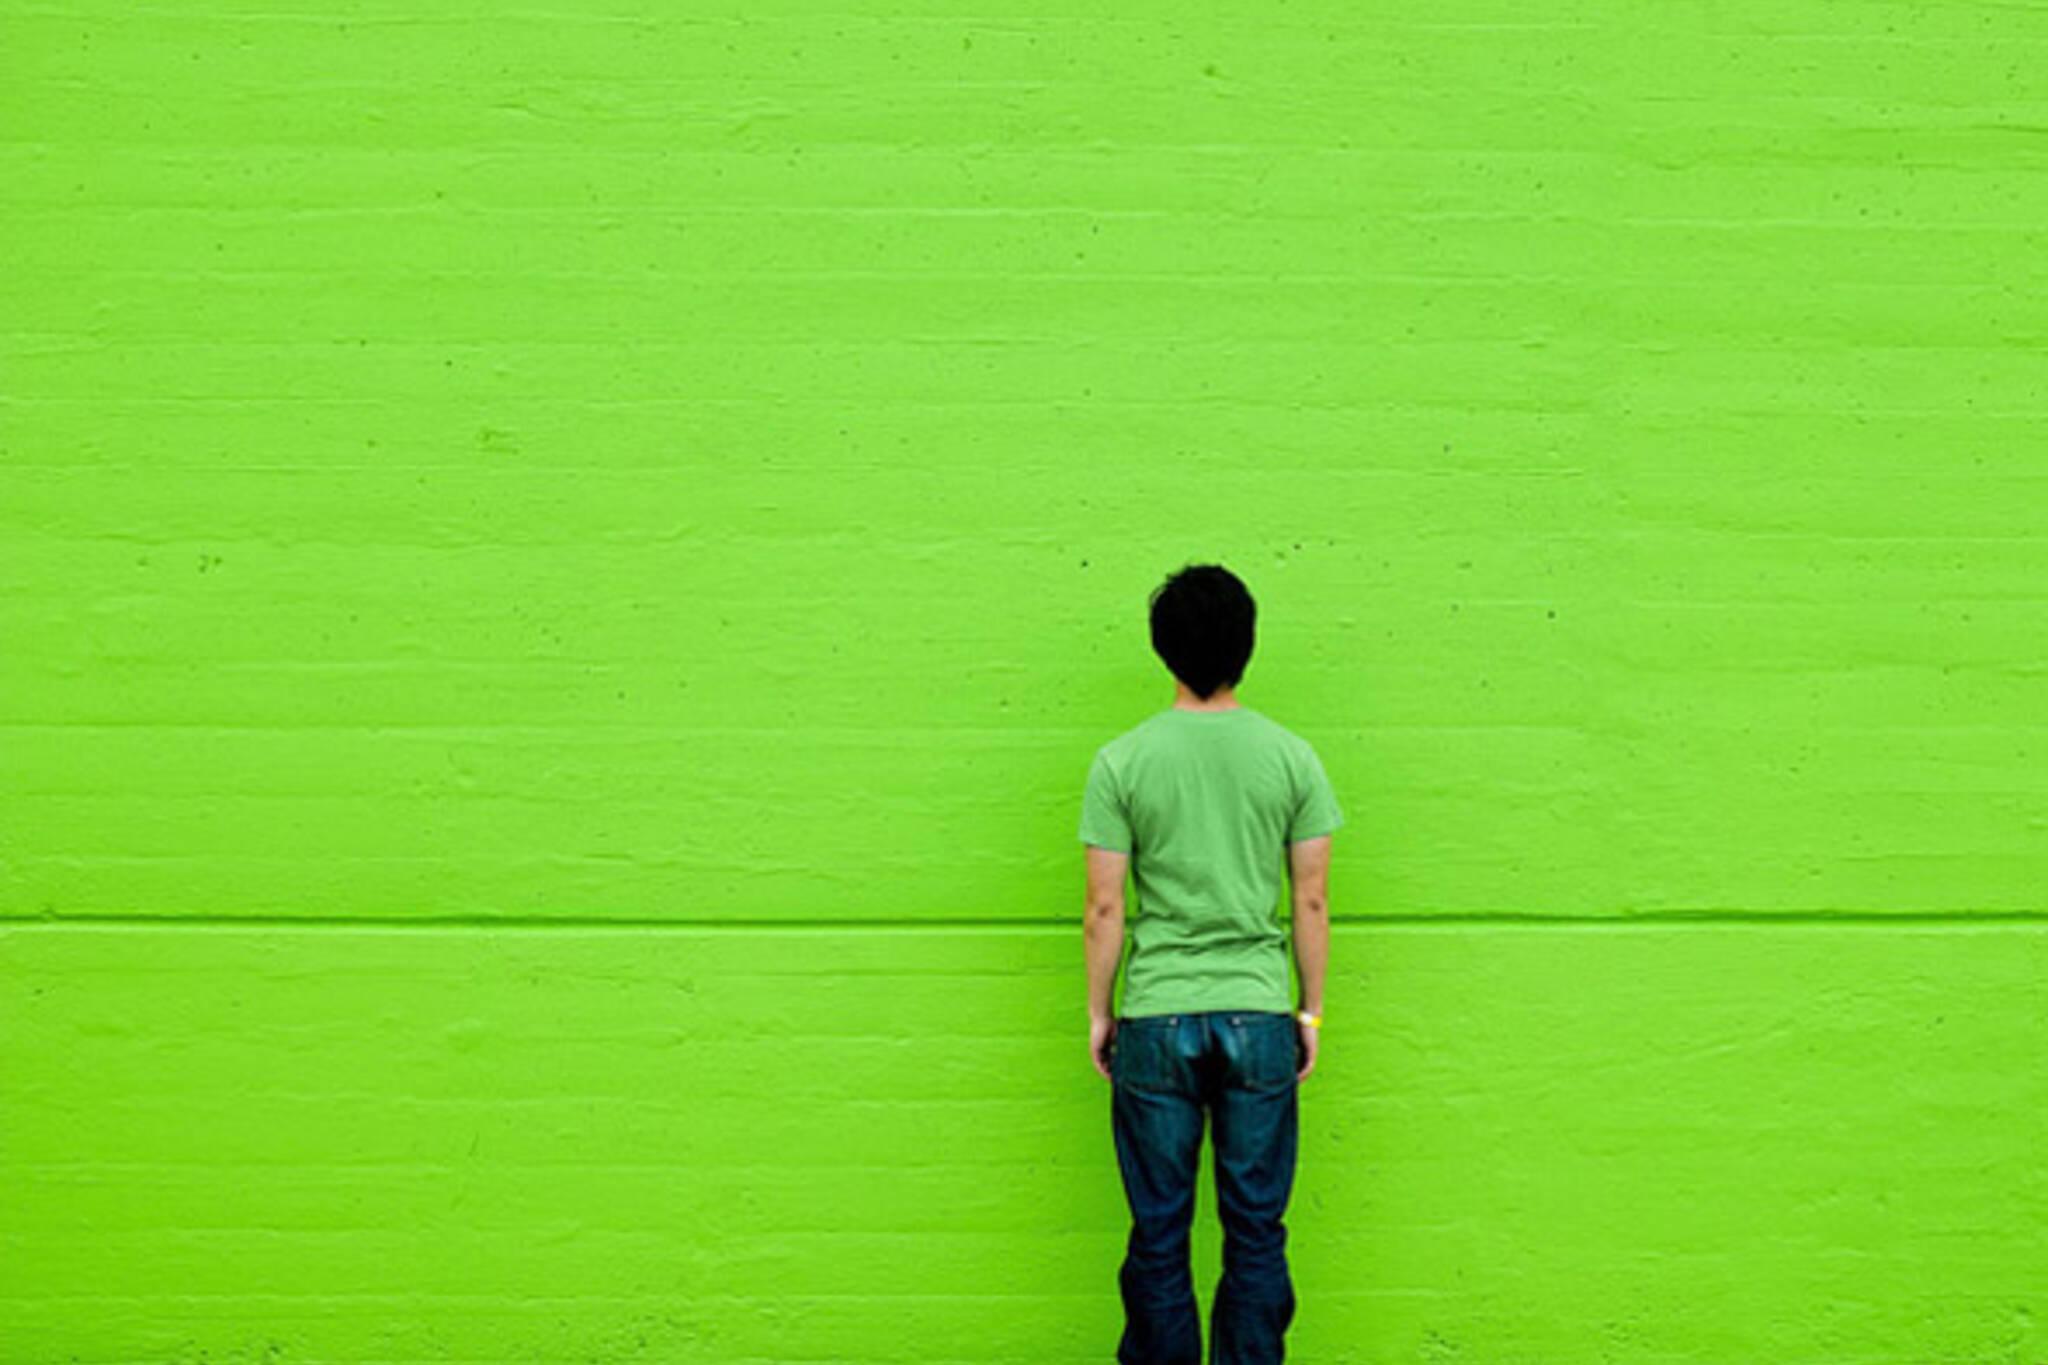 green, wall, shirt